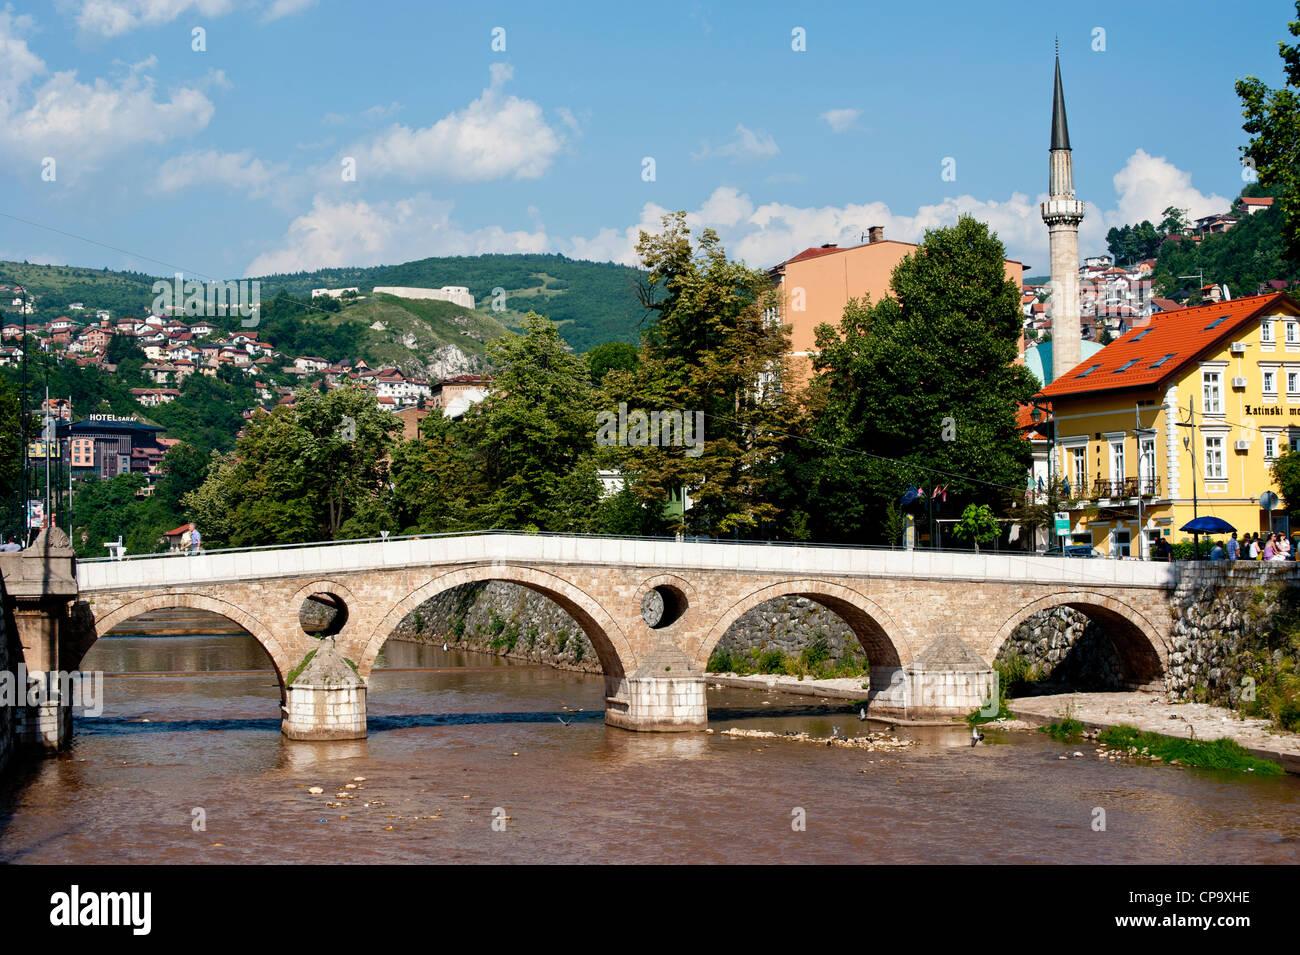 Latin Bridge on Miljacka River, place where was killed the Archduke Franz Ferdinand. Sarajevo. Bosnia- Herzegovina. - Stock Image